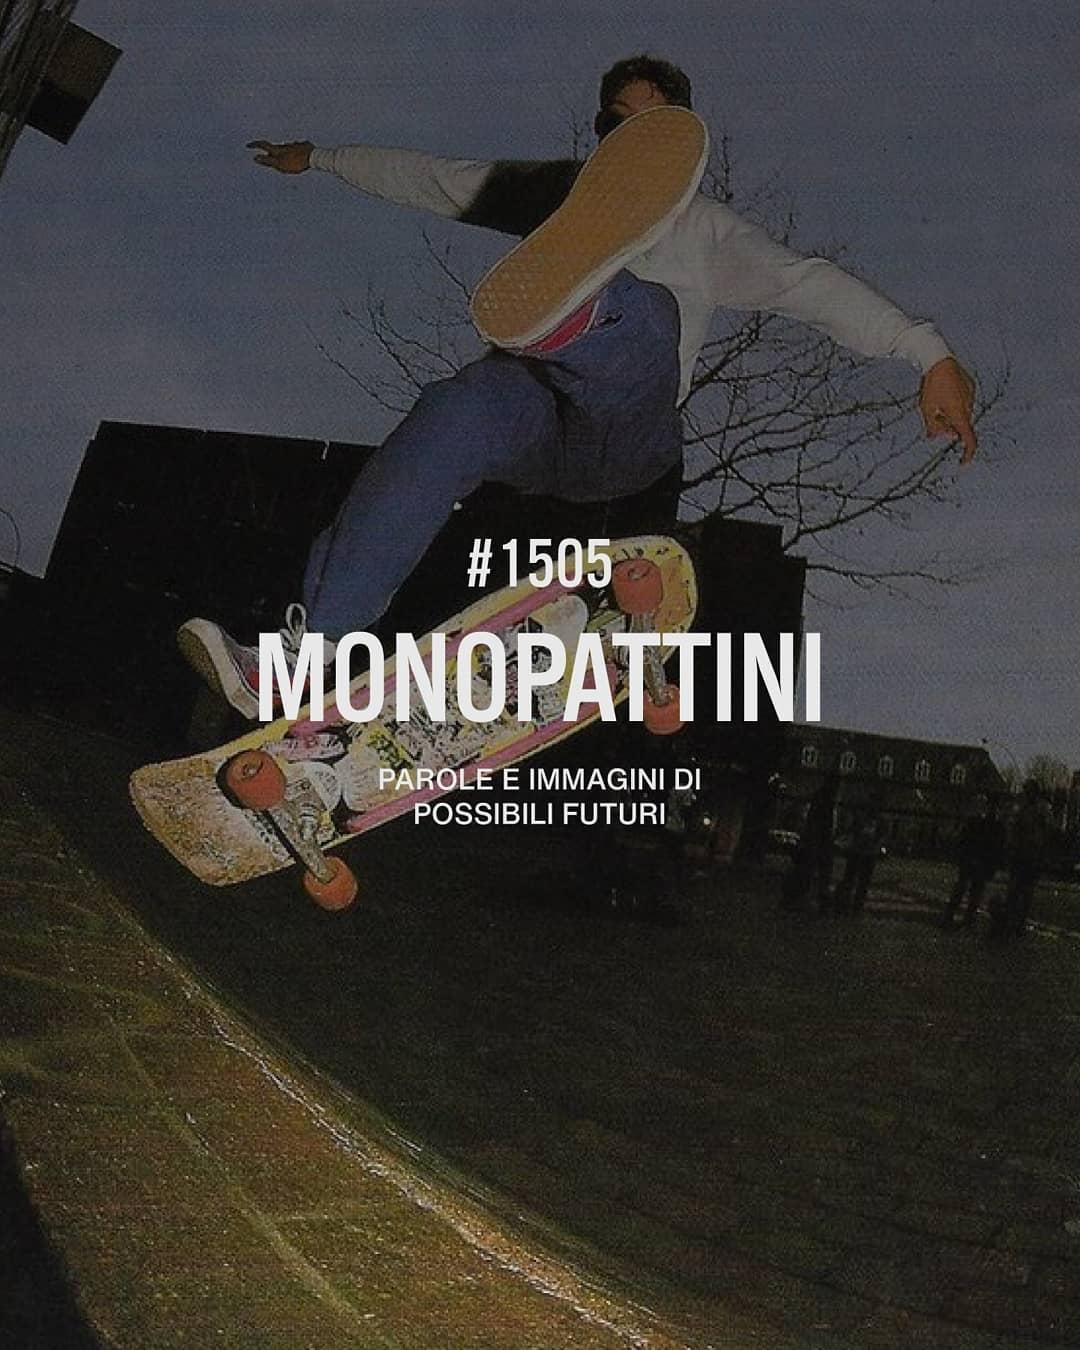 Monopattini_1